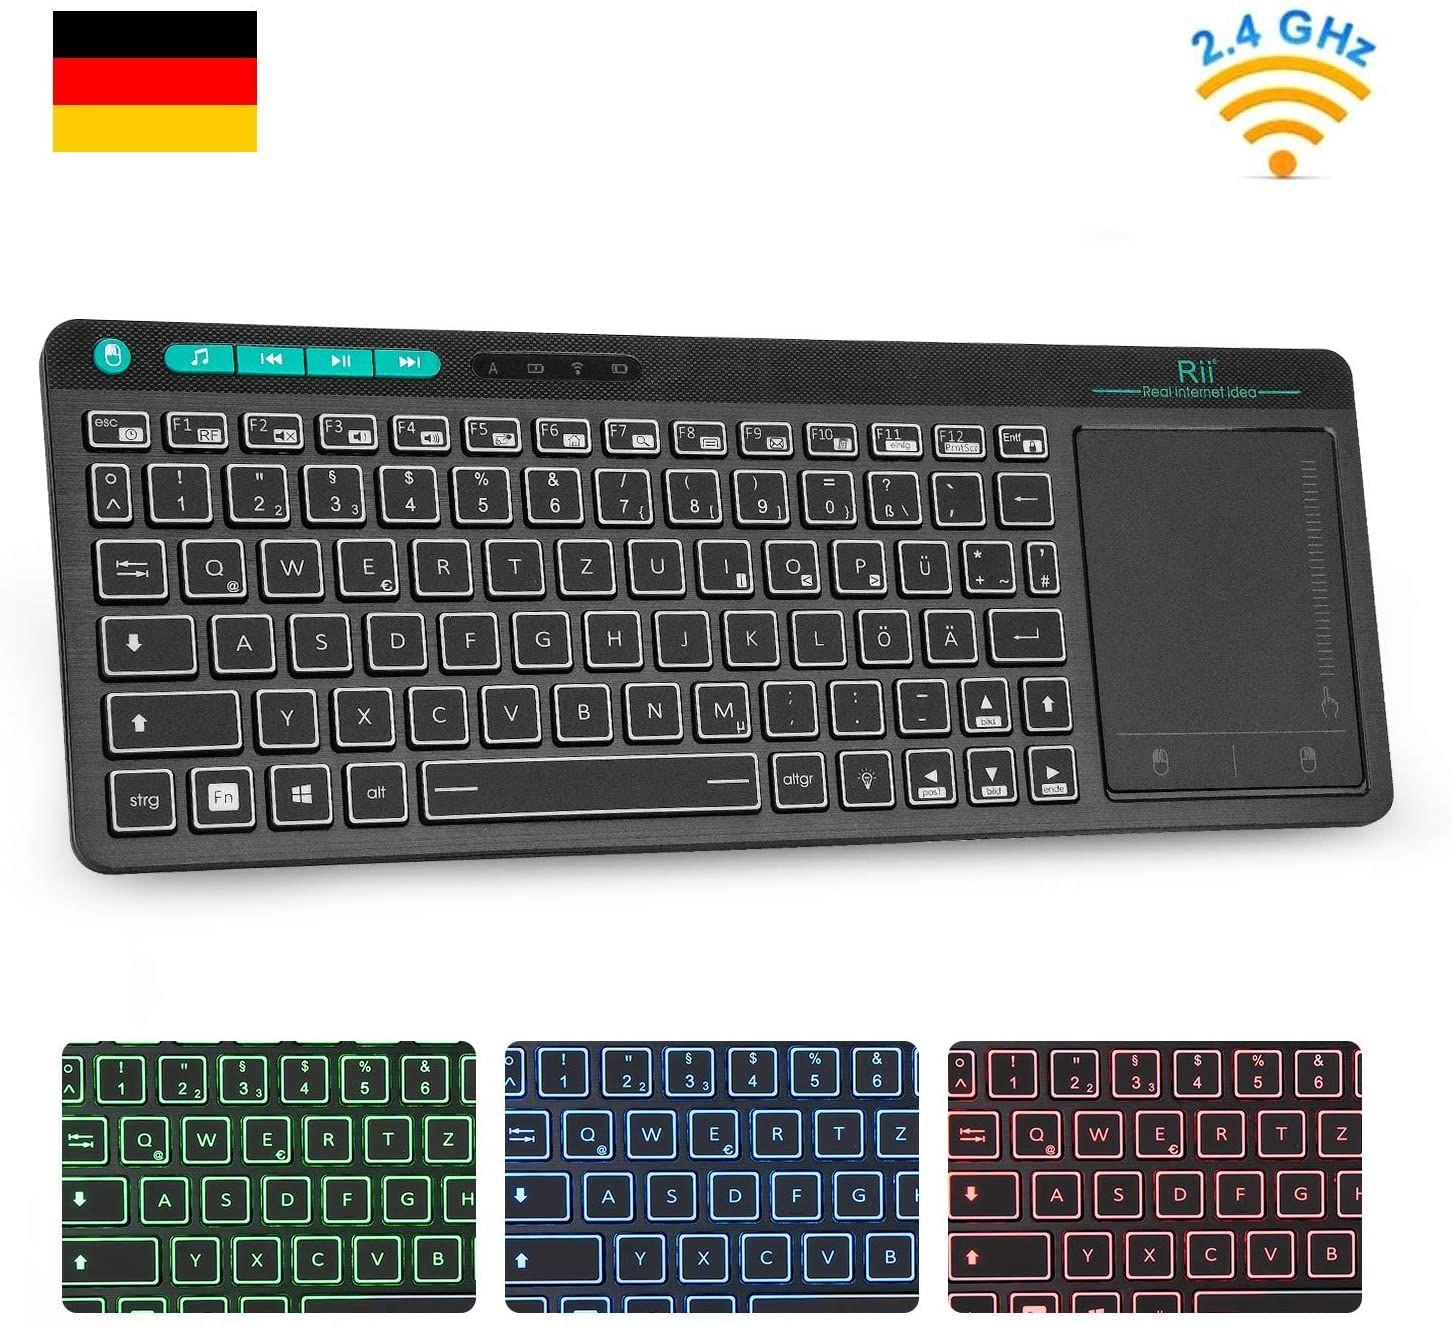 Rii K18 Plus Kabellose Tv Tastatur Wireless Touchpad Tastatur Beleuchtet Tastatur Mit 3 Led Hinter In 2020 Led Hintergrundbeleuchtung Tastatur Hintergrundbeleuchtung